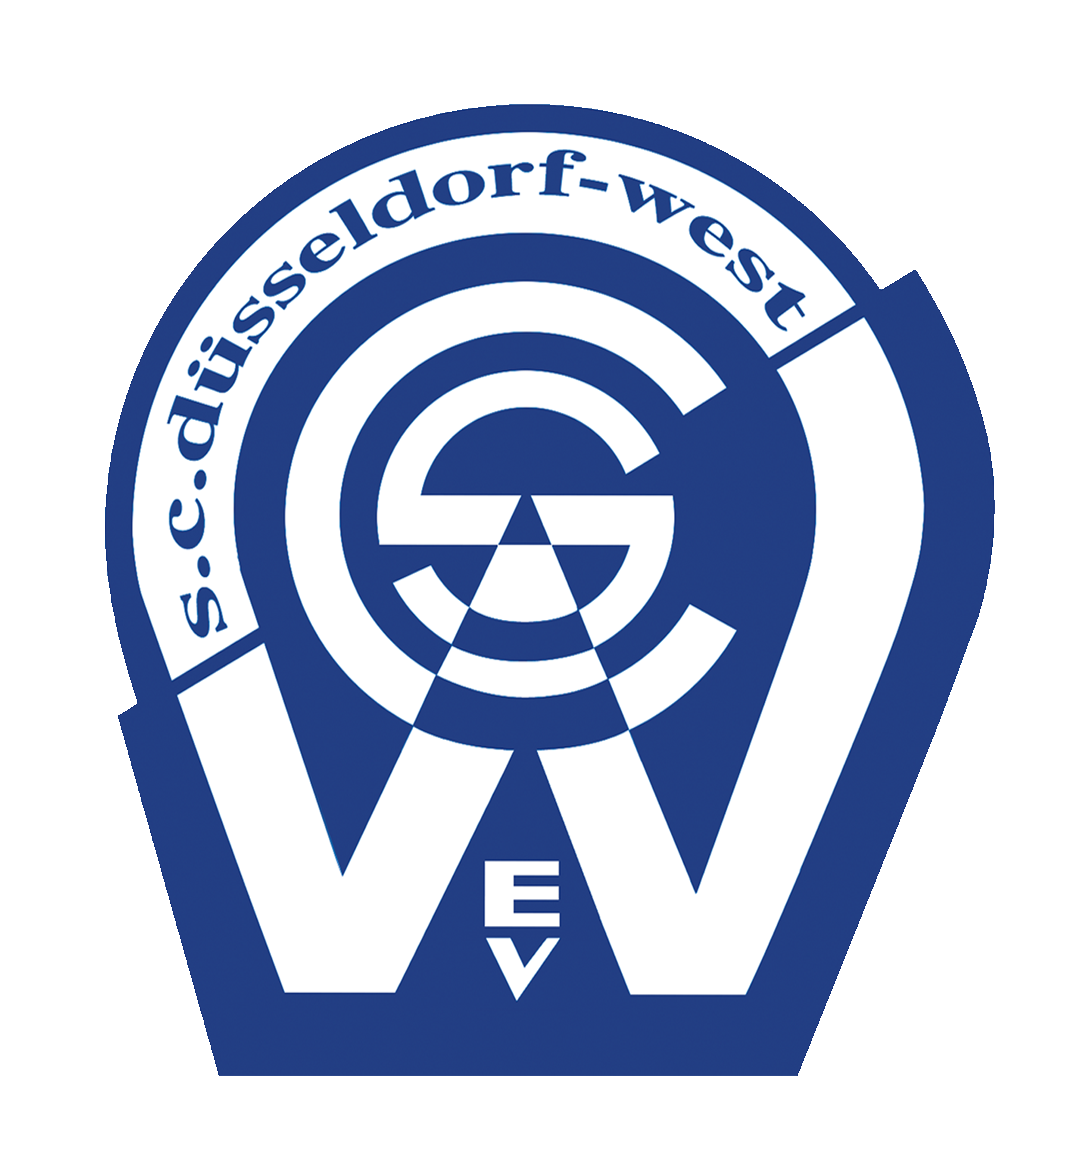 SC Düsseldorf-West 1919/1950 e.V.